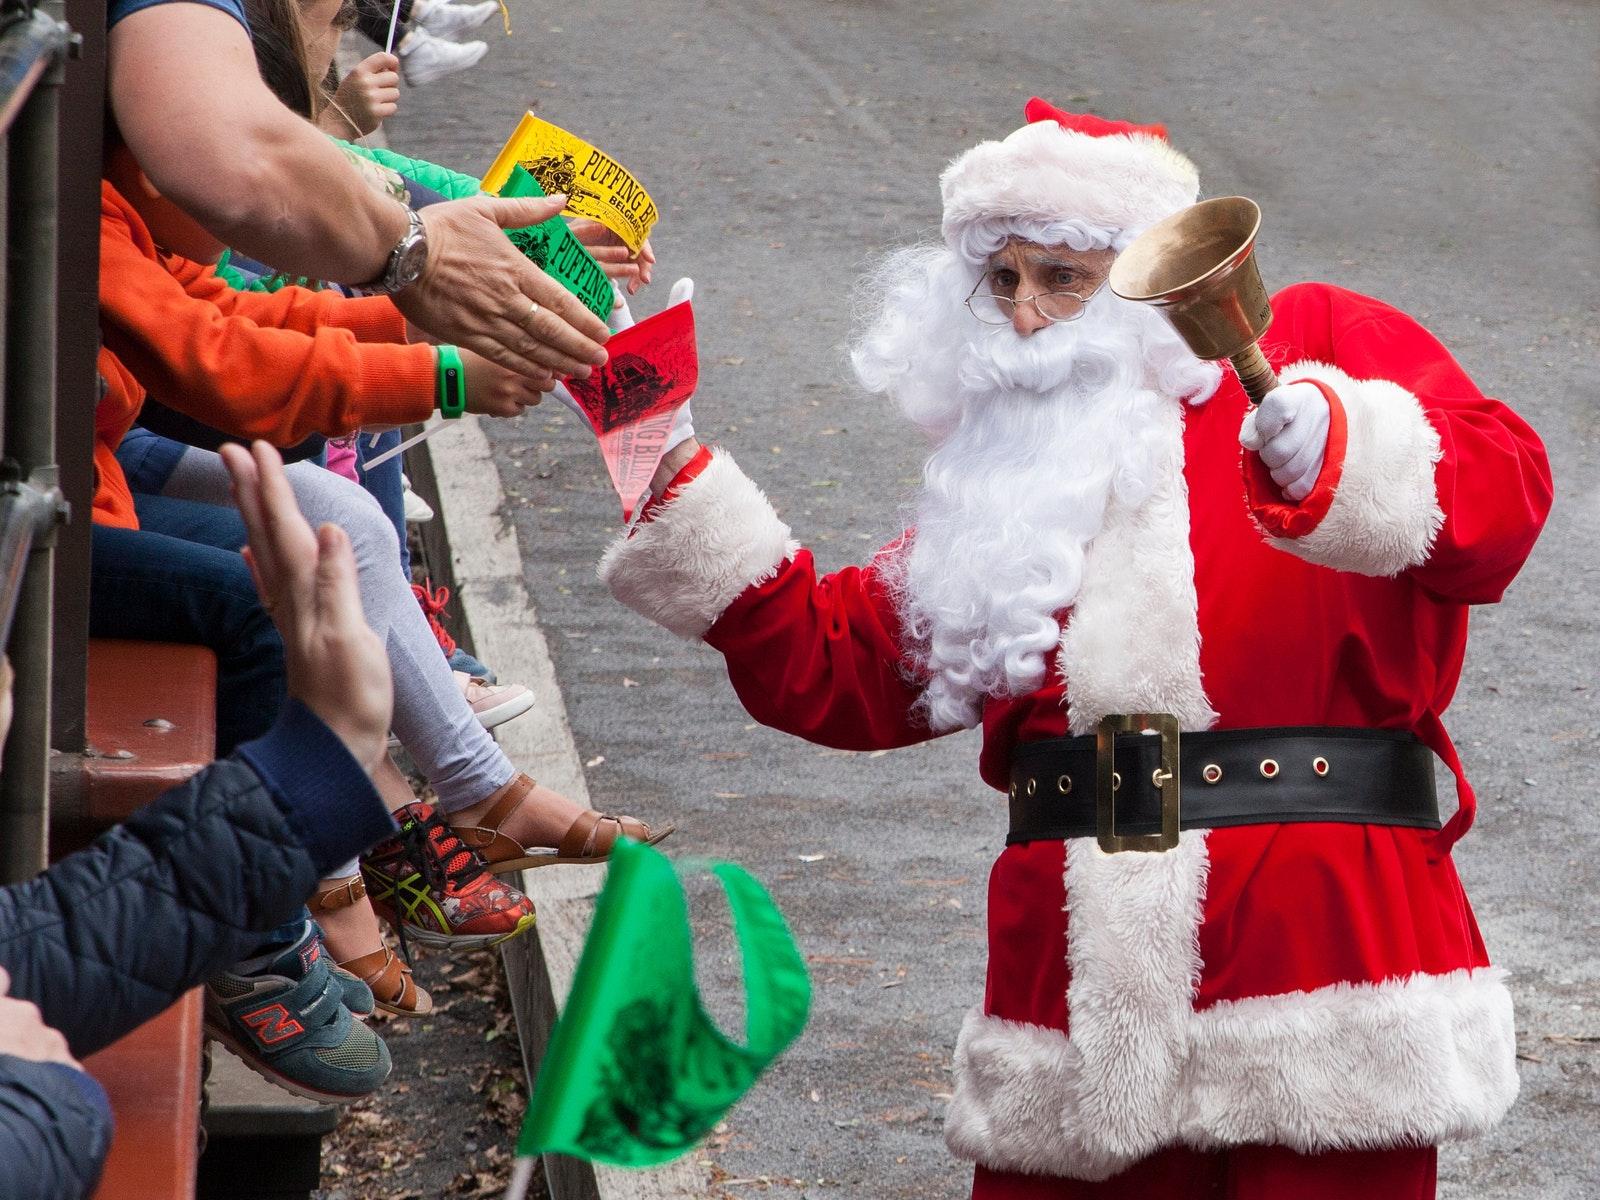 Santa hi-fiving children on Puffing Billy train